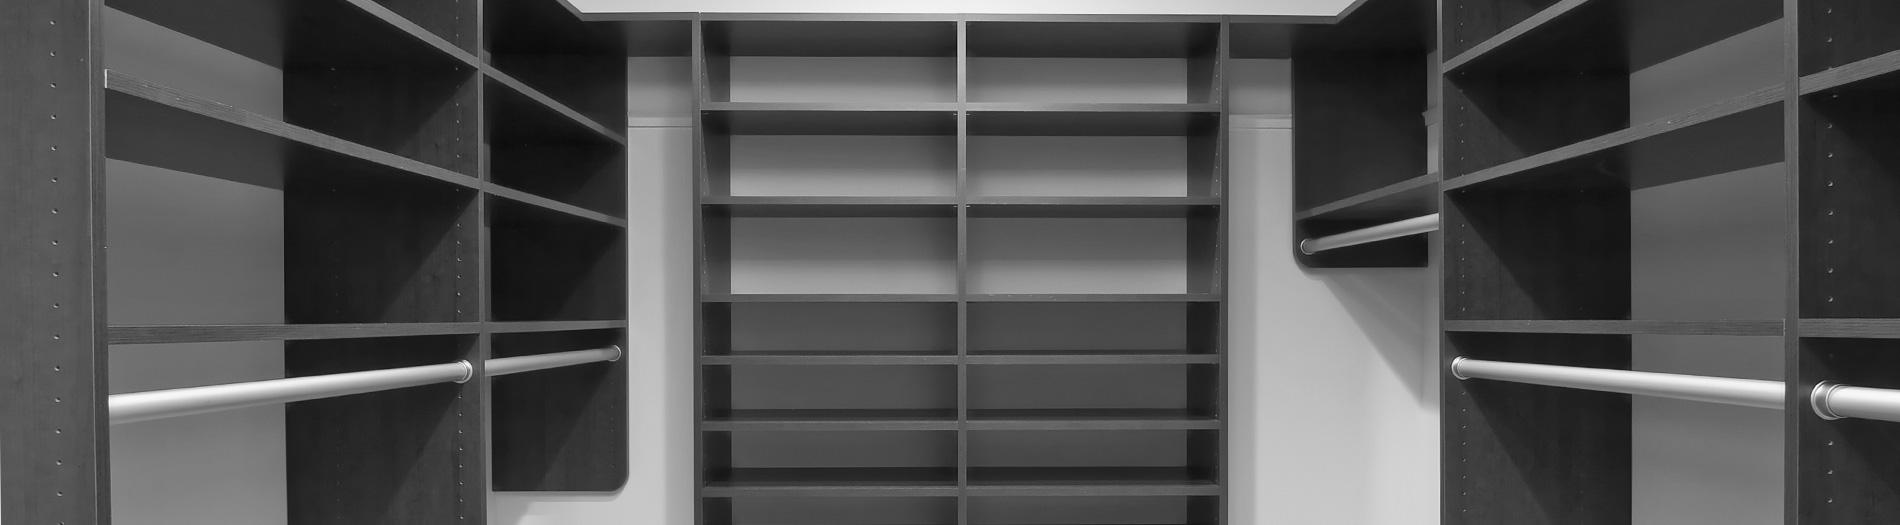 st-charles-closets-banner-5-gray